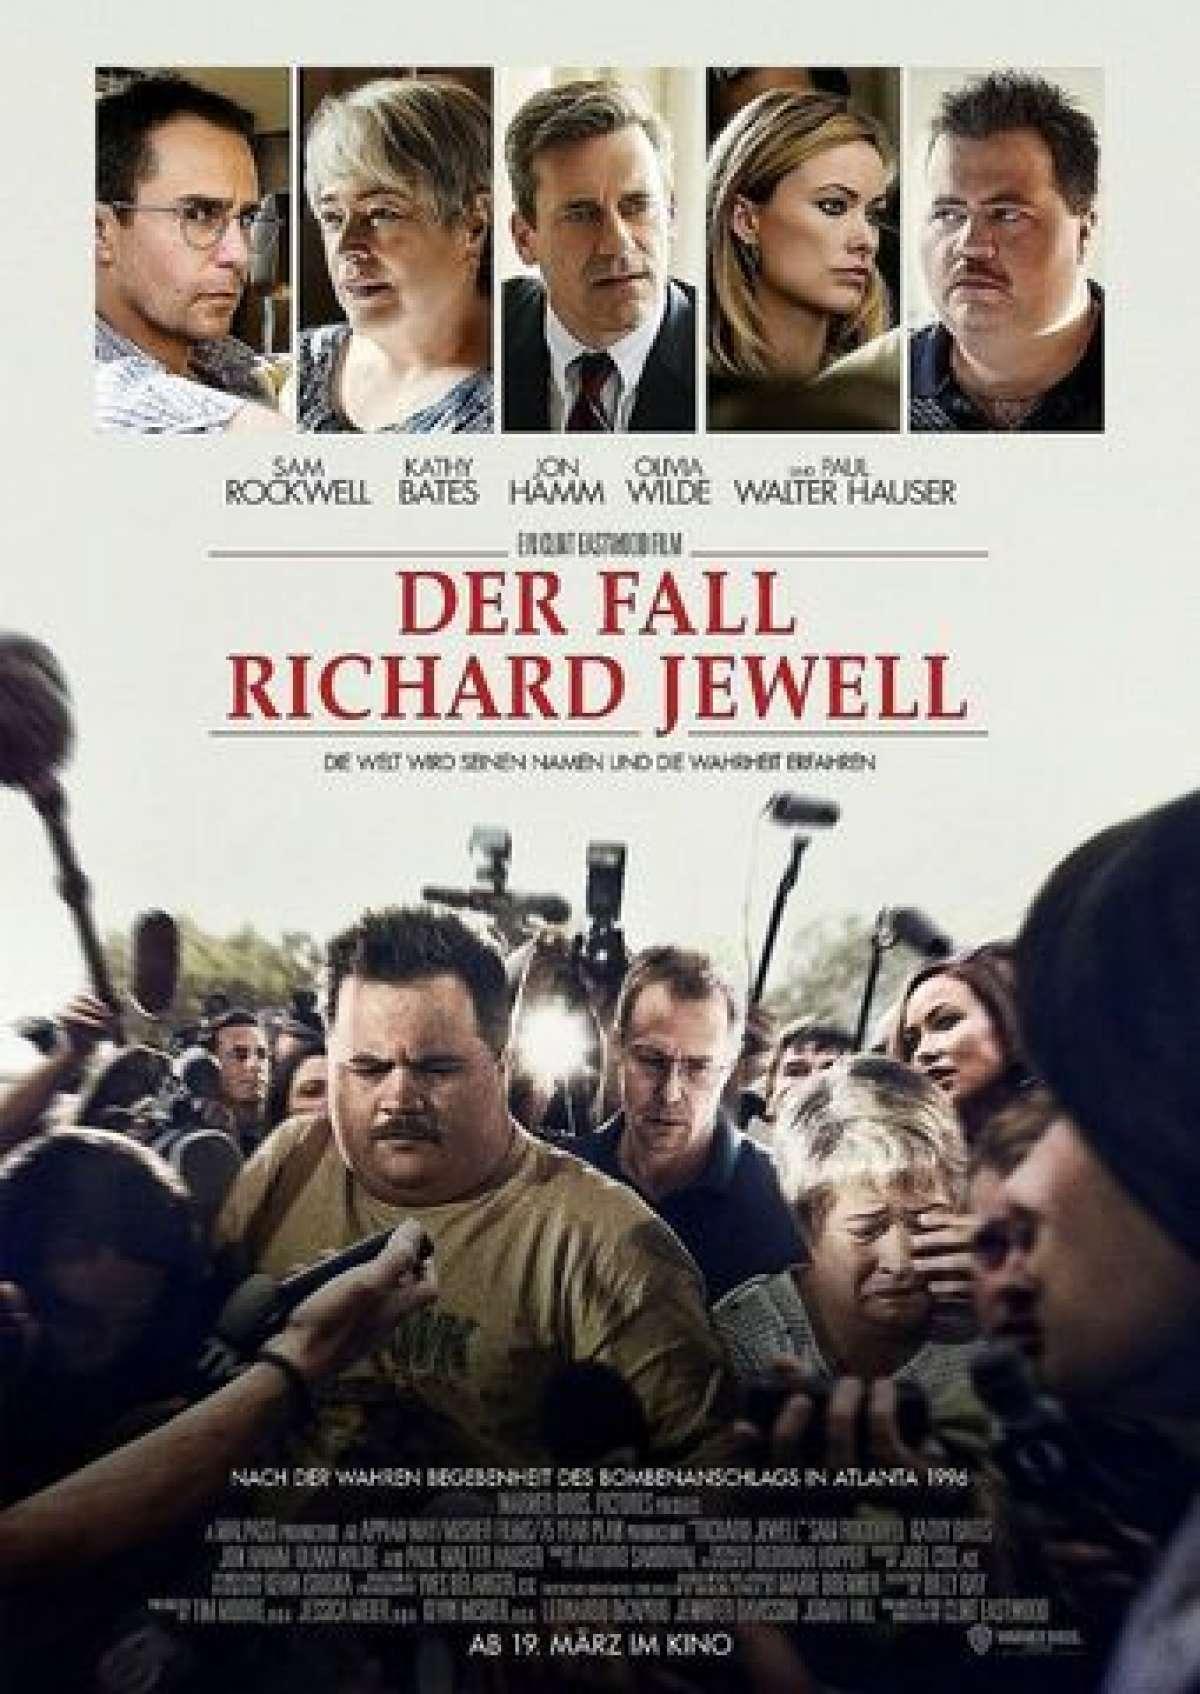 Der Fall Richard Jewell - Cineplex  - Baunatal